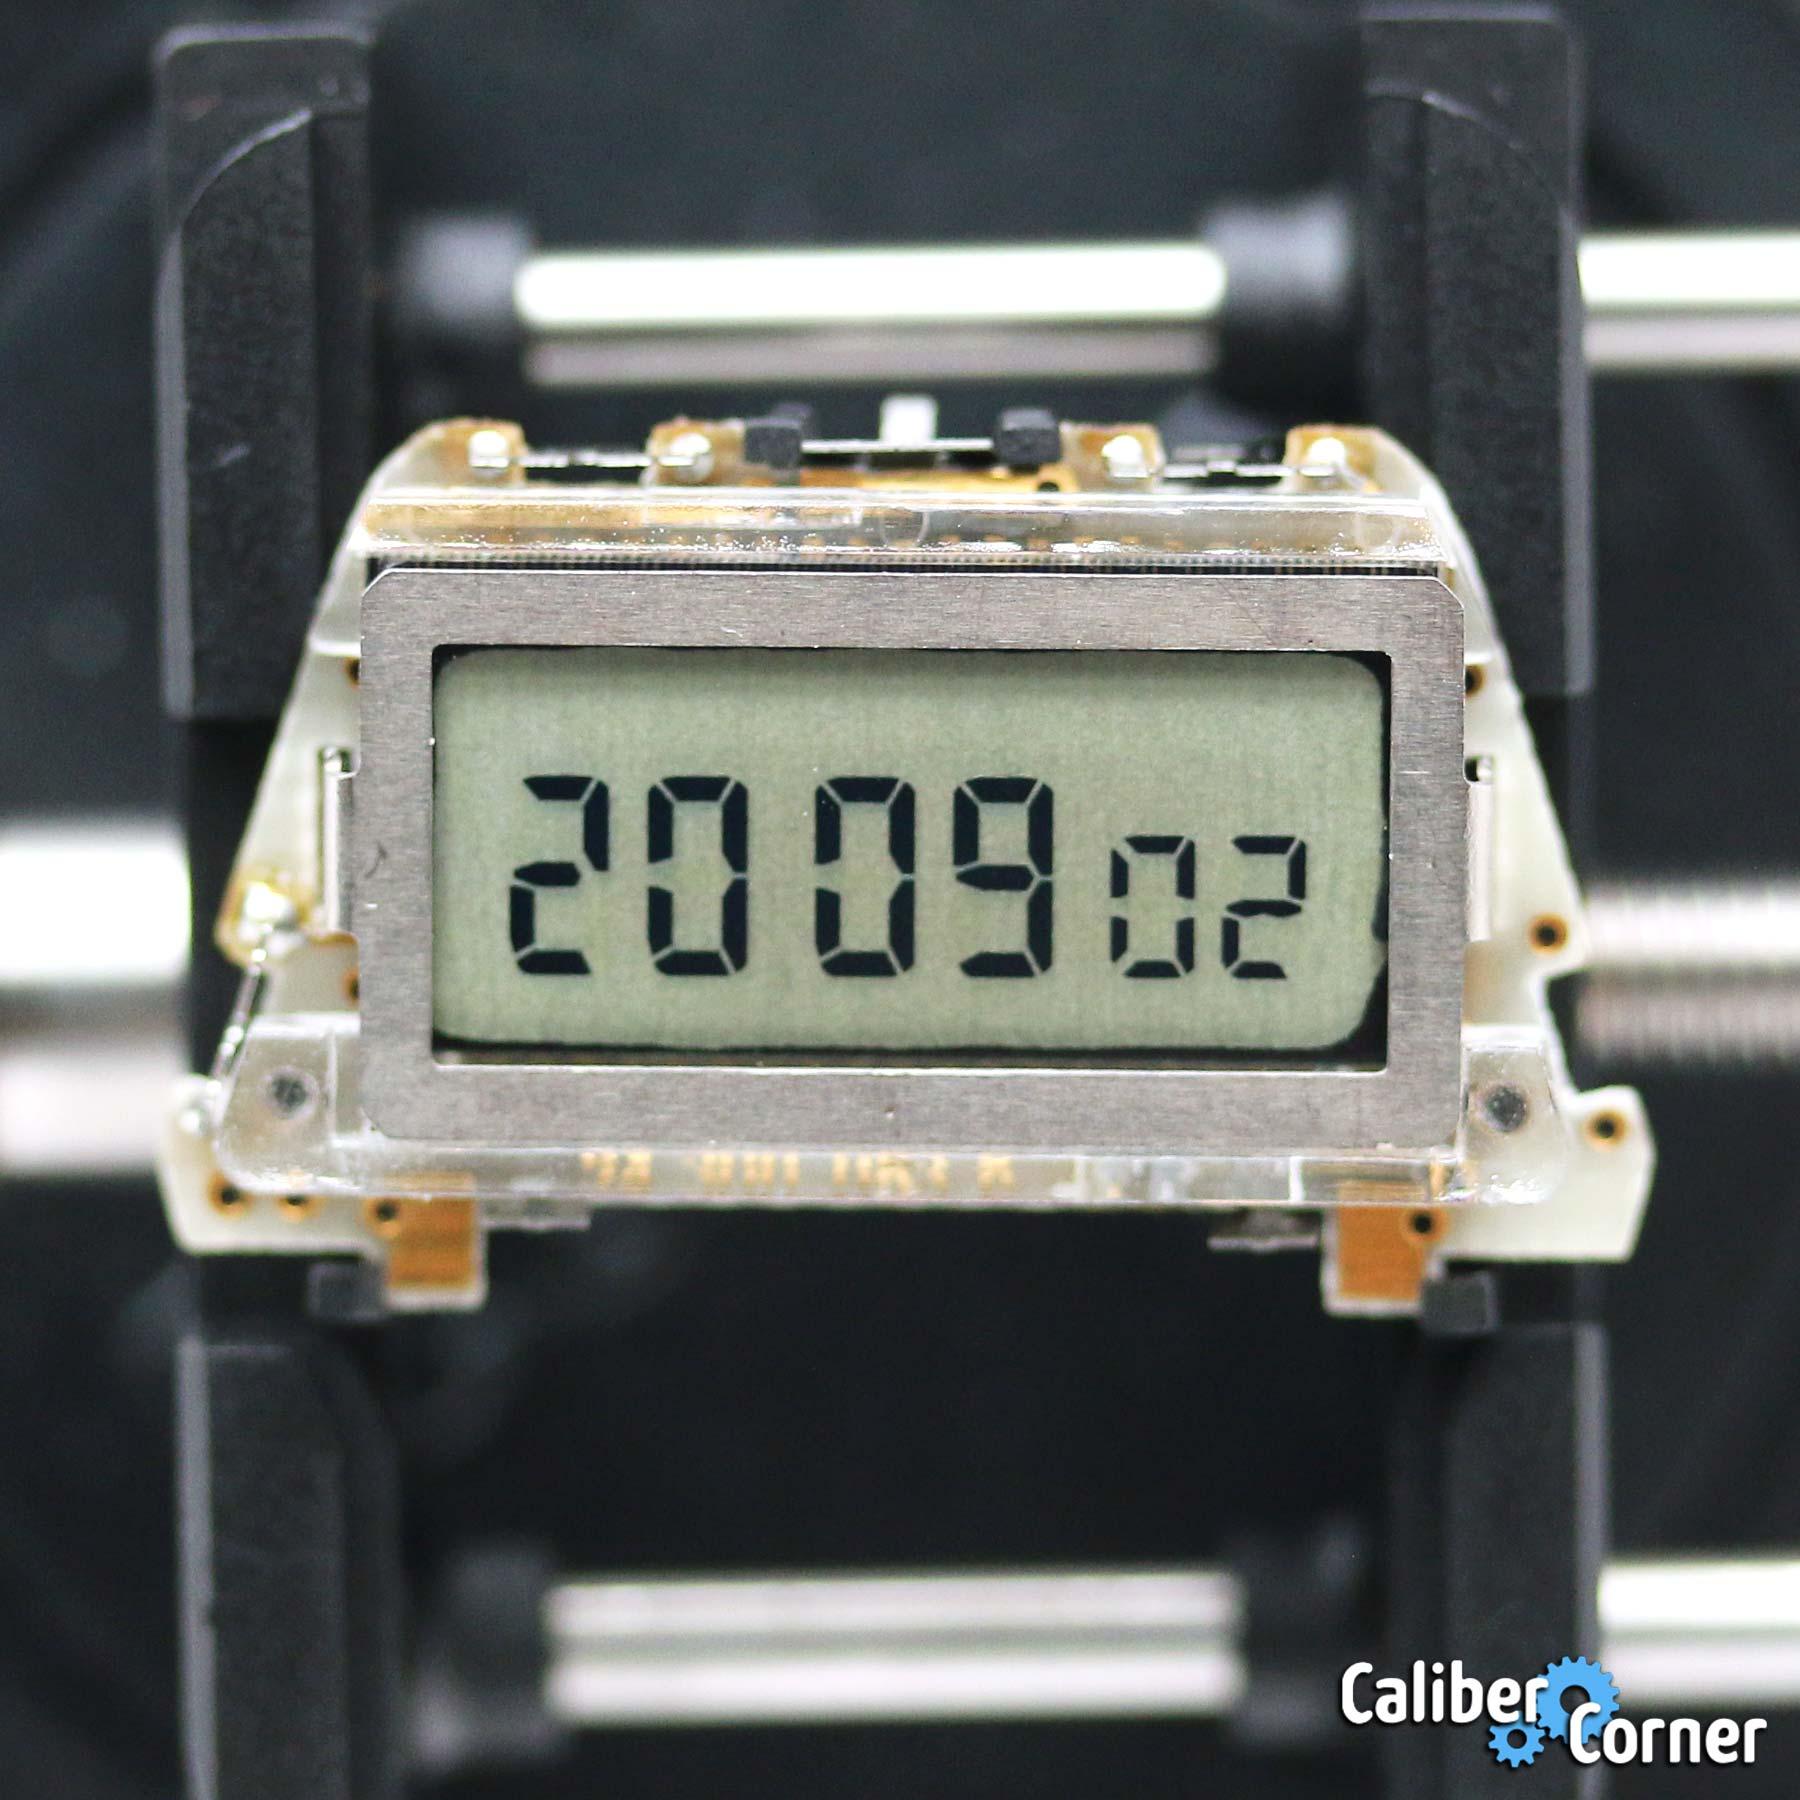 Heuer Caliber 107 Digital